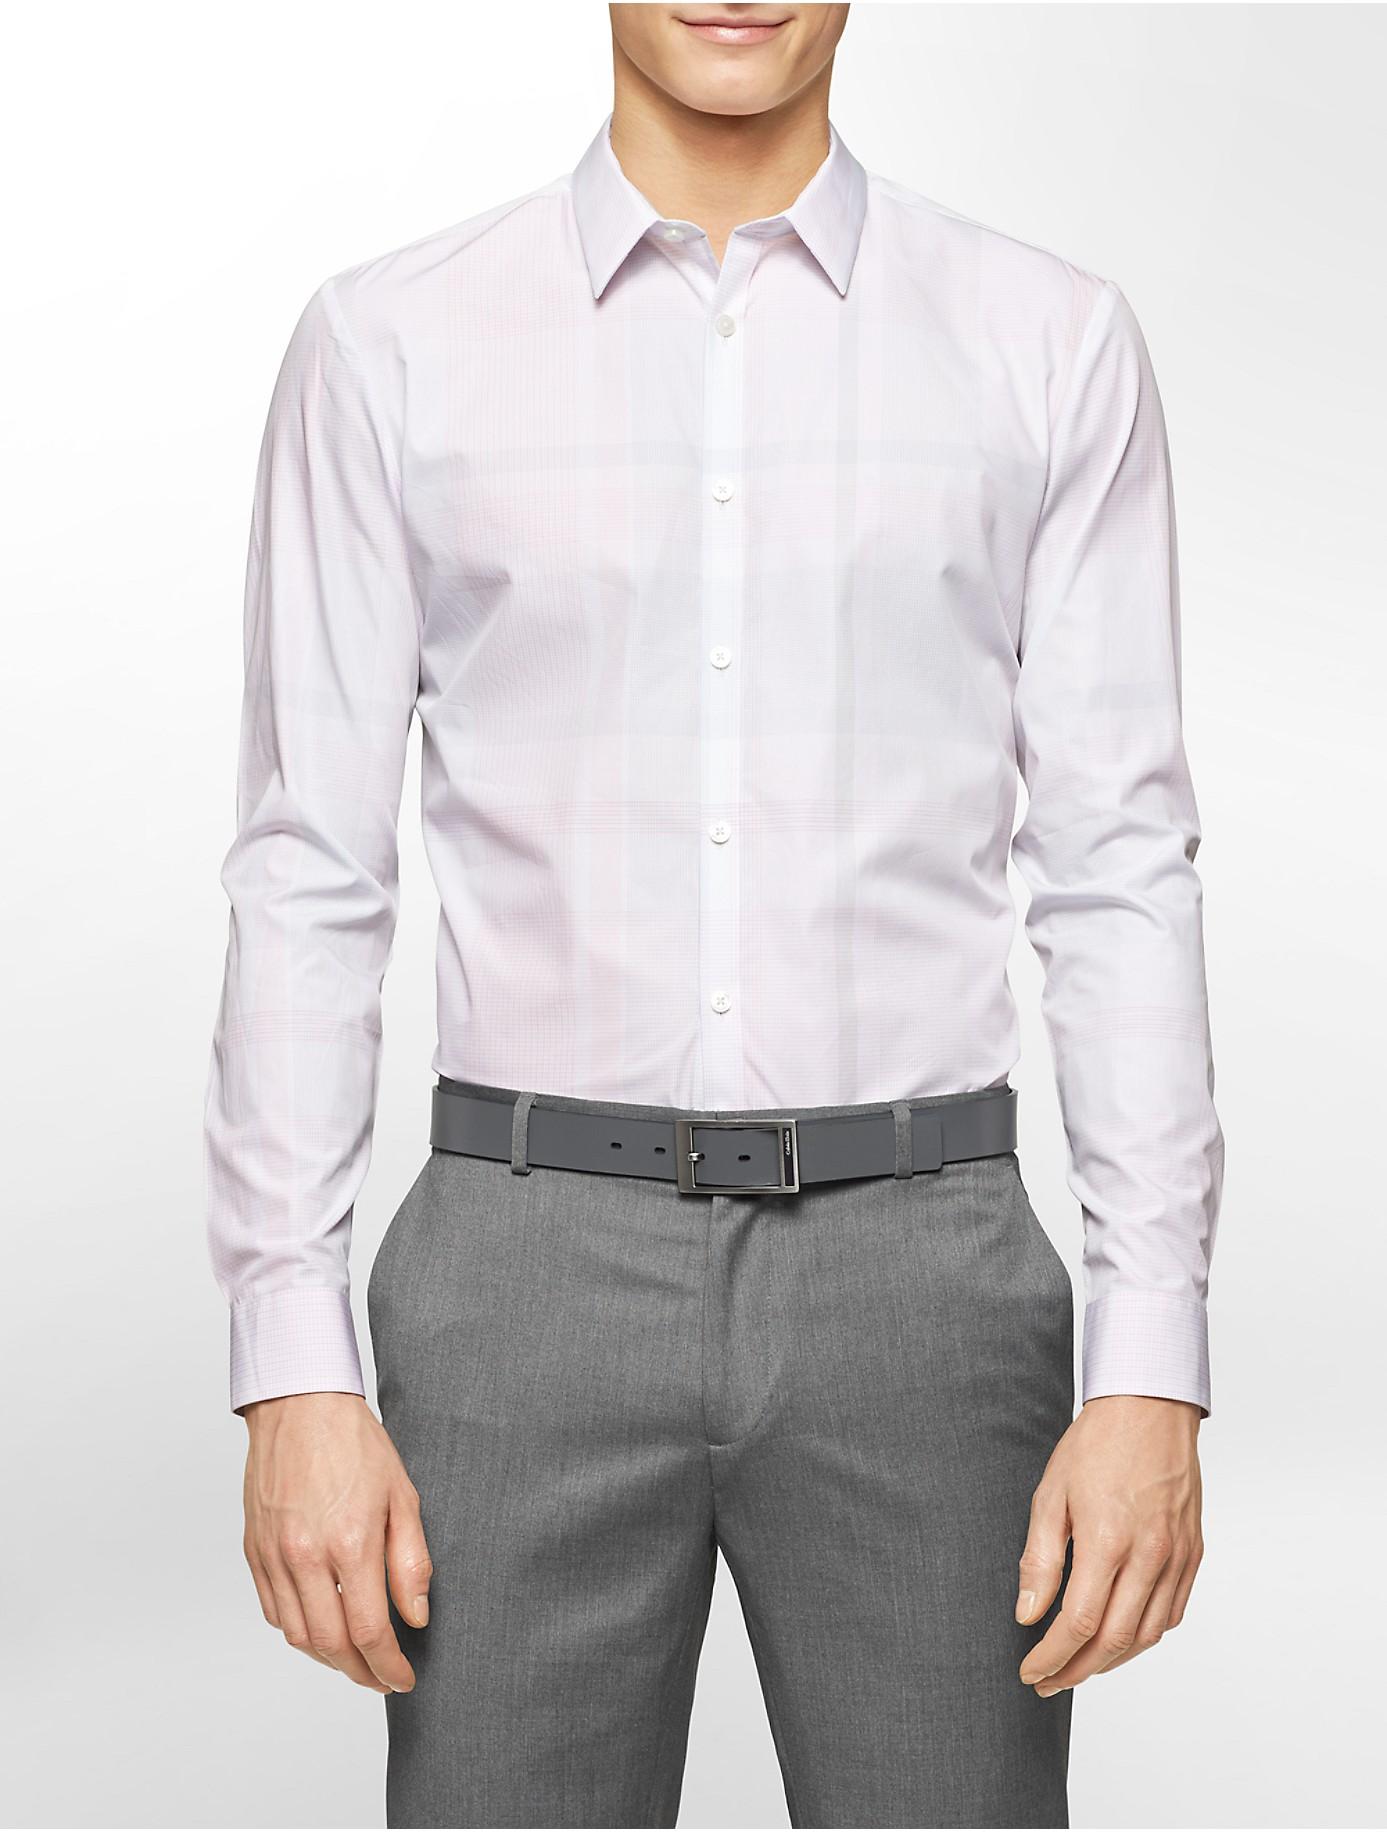 Calvin Klein White Label Premium Slim Fit Plaid Shirt In